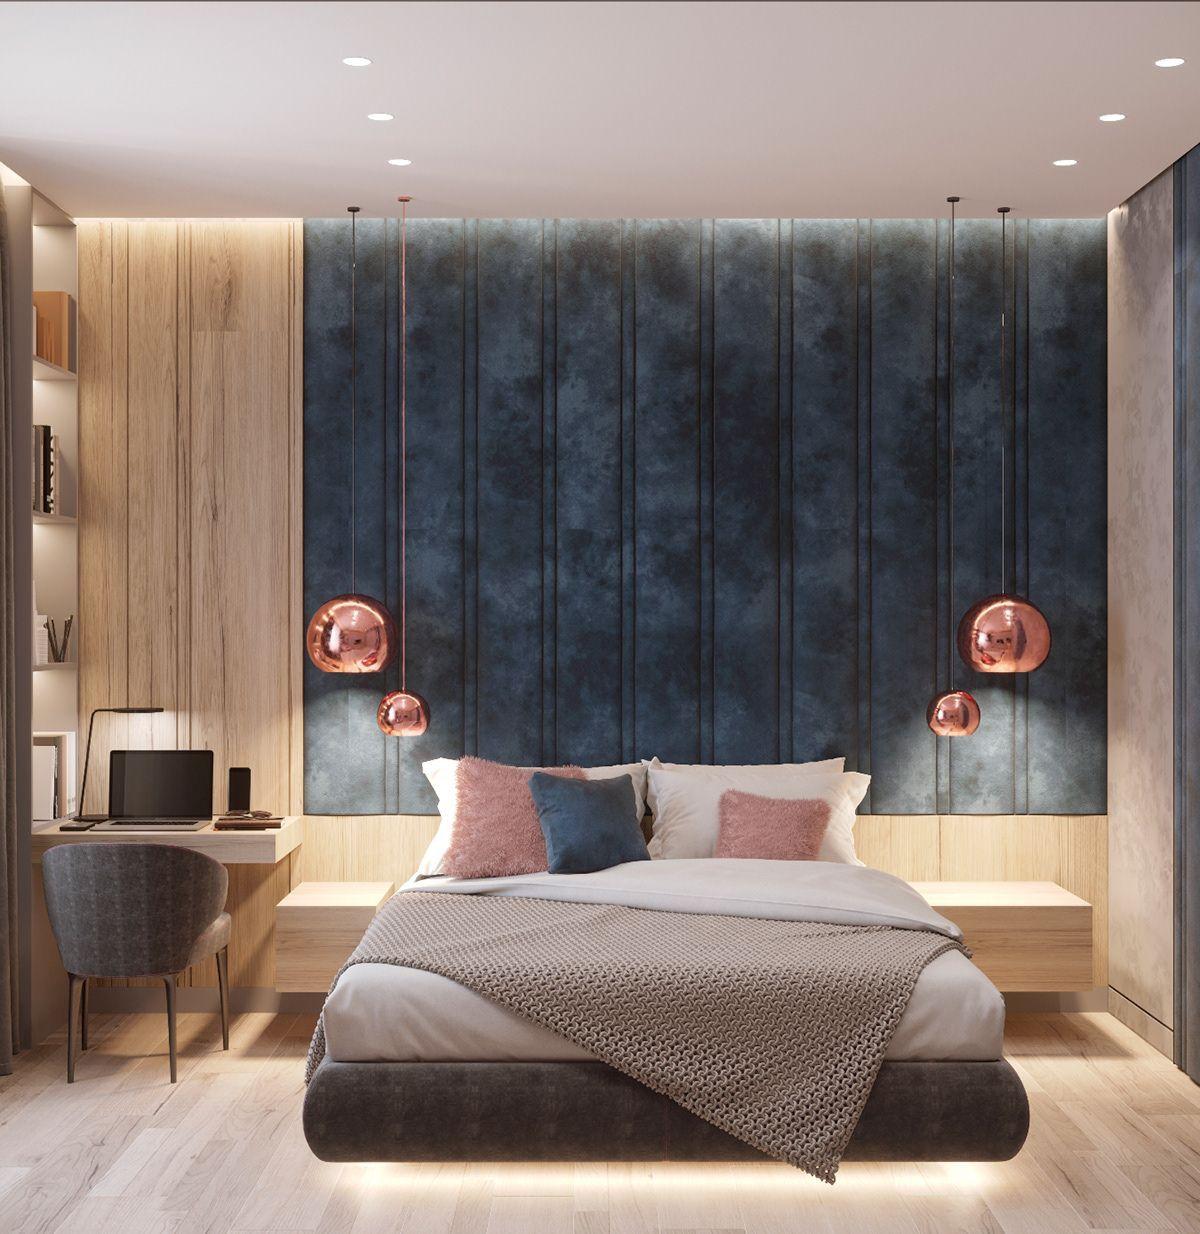 Luxury Master Bedroom Dubai On Behance: COMPROMISE On Behance In 2020